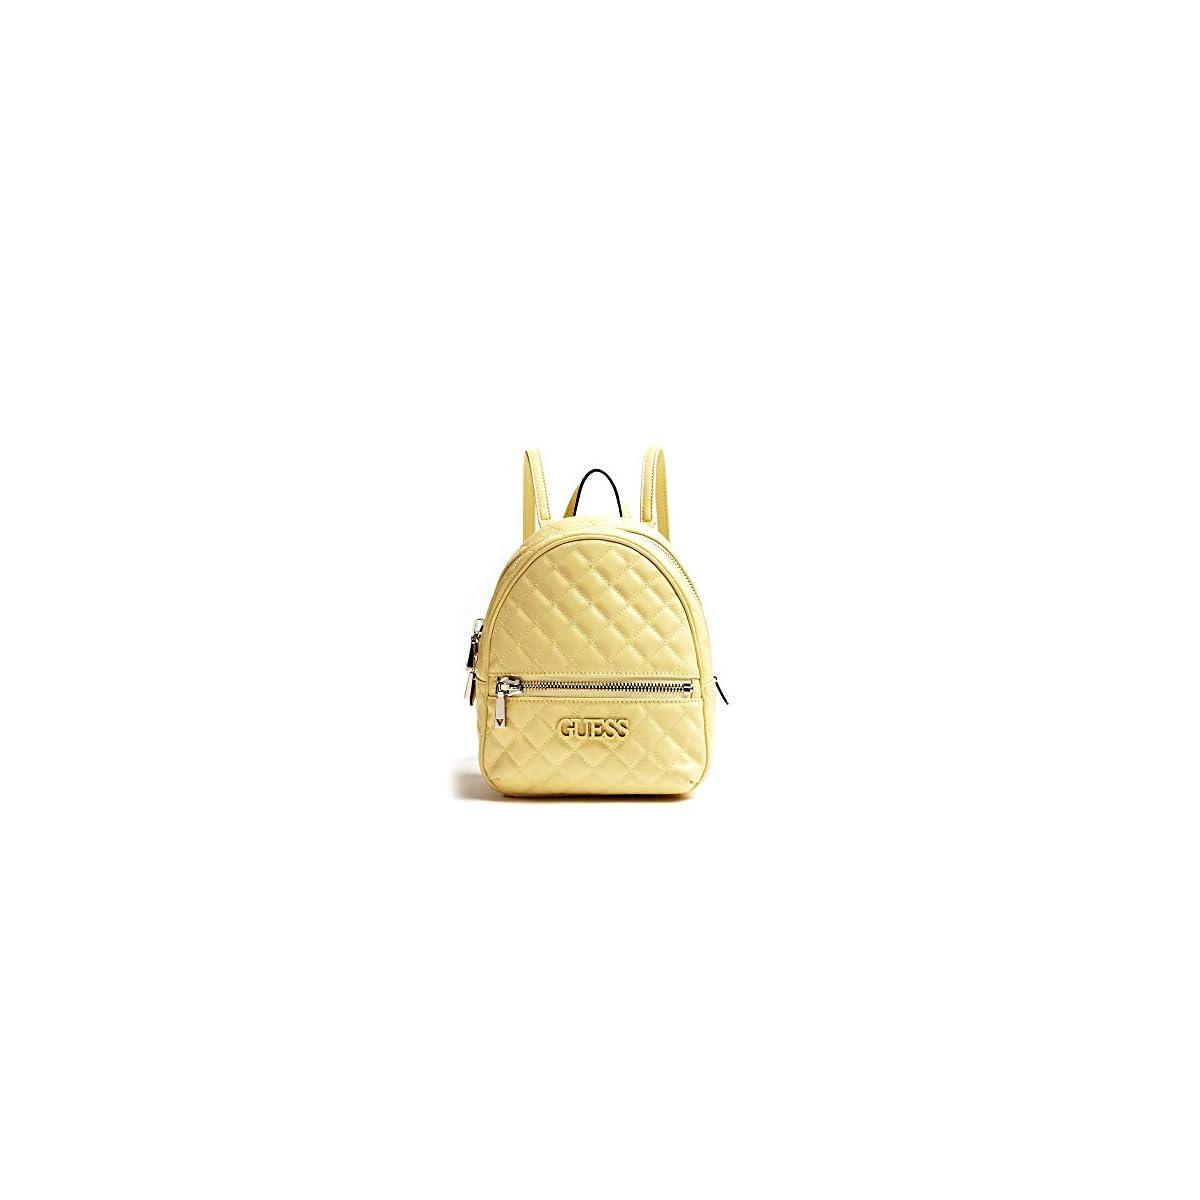 41InQEmYzjL. SS1200  - Guess Elliana Backpack - Mochilas Mujer